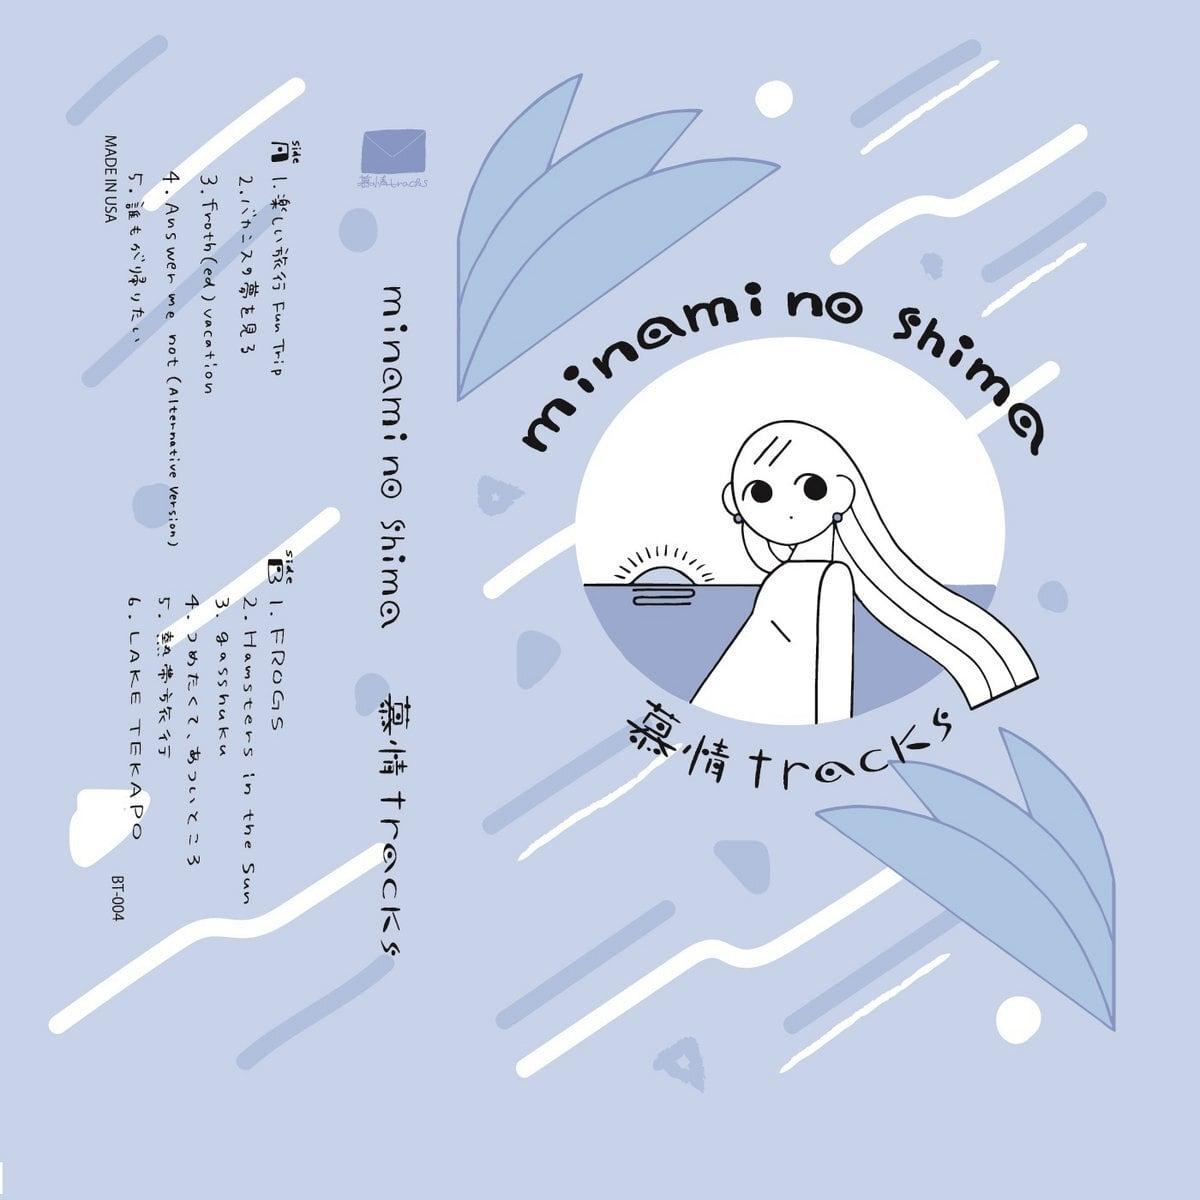 V.A. - minami no shima (Cassette Tape)